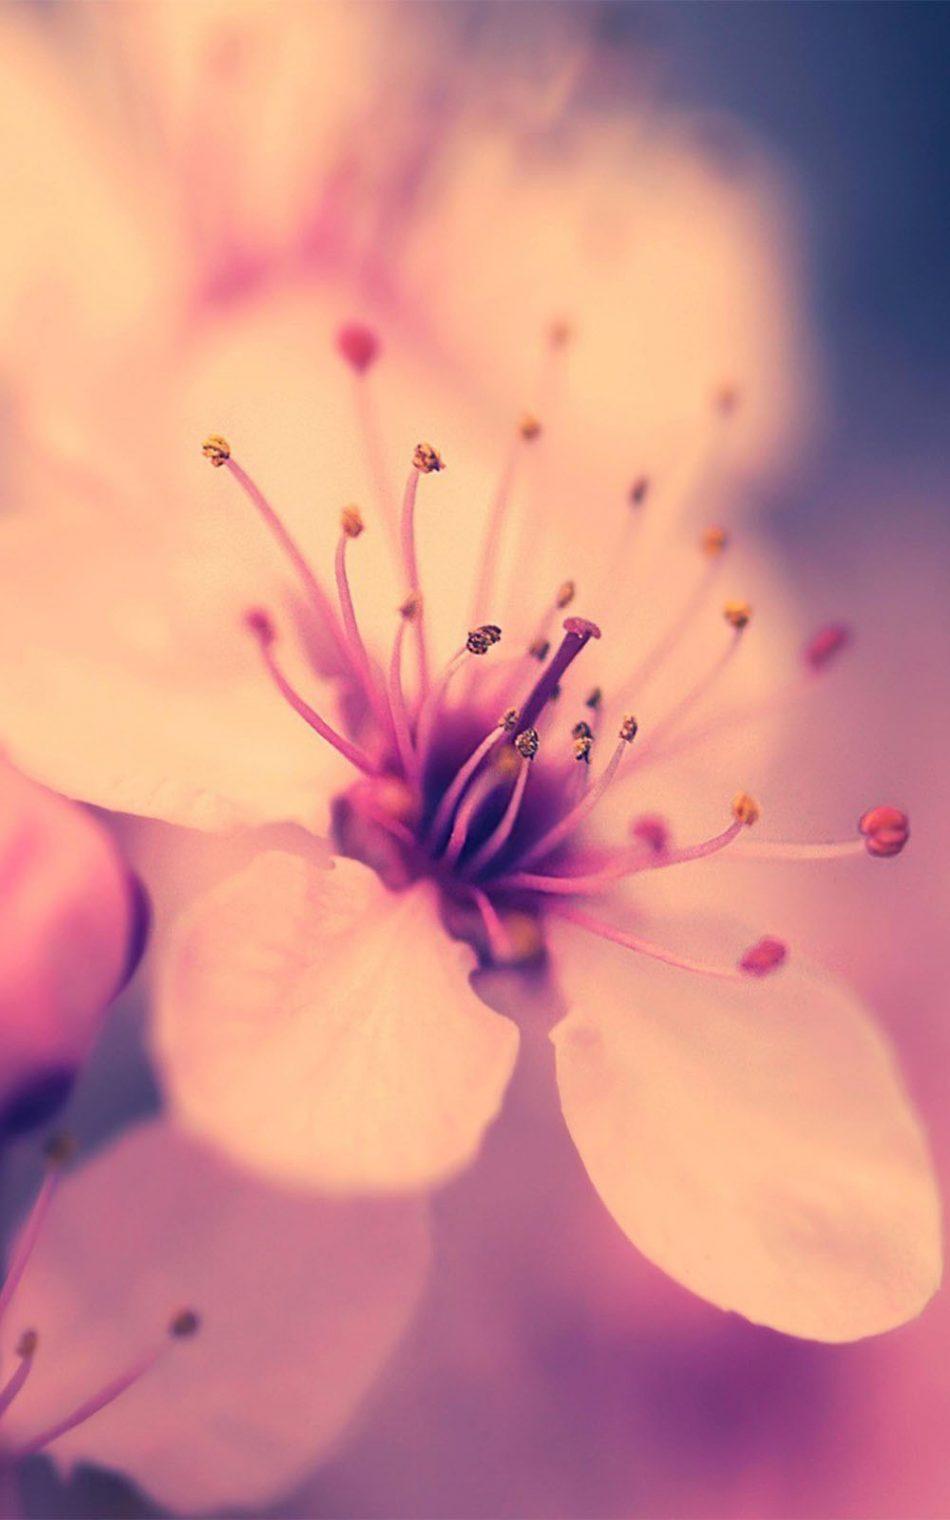 Download Cherry Blossom Free Pure 4k Ultra Hd Mobile Wallpaper